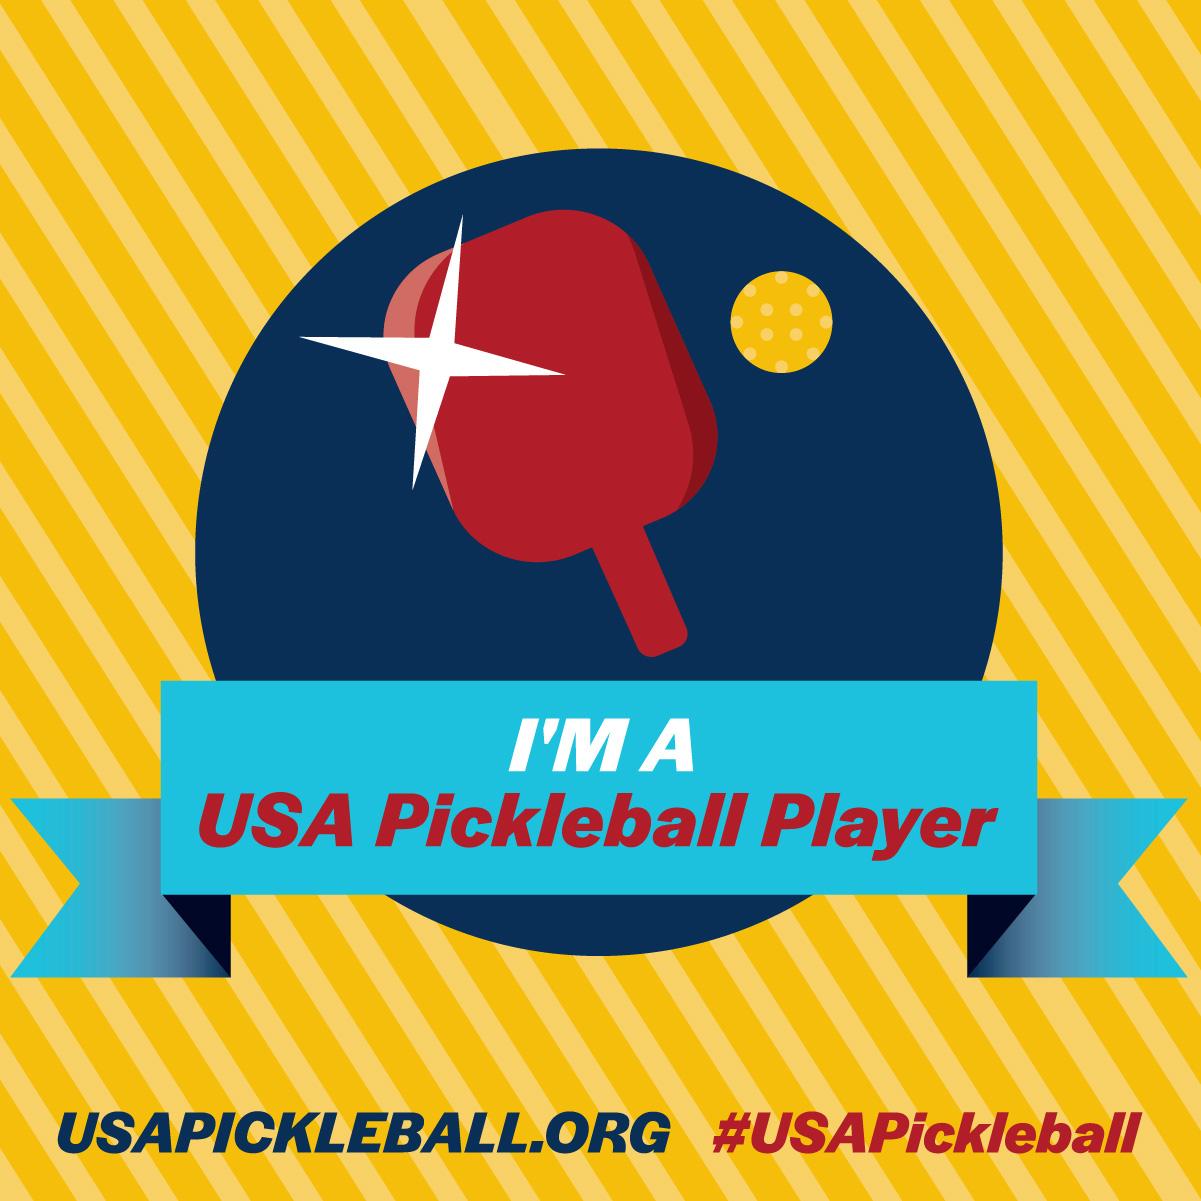 Im a Pickleball Player